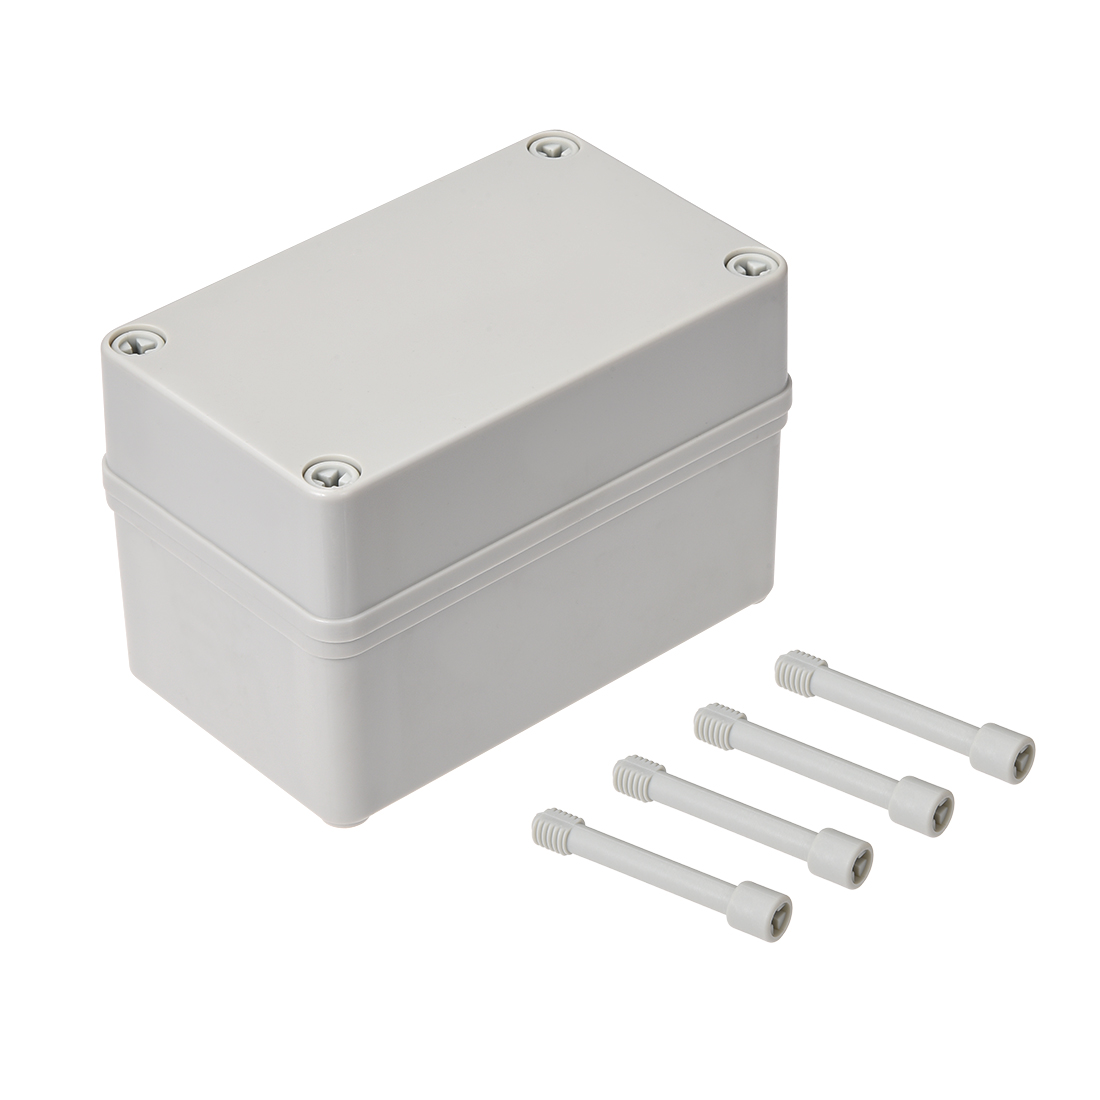 130mm x 80mm x 85mm Dustproof IP65 Junction Box DIY Case Enclosure Gray